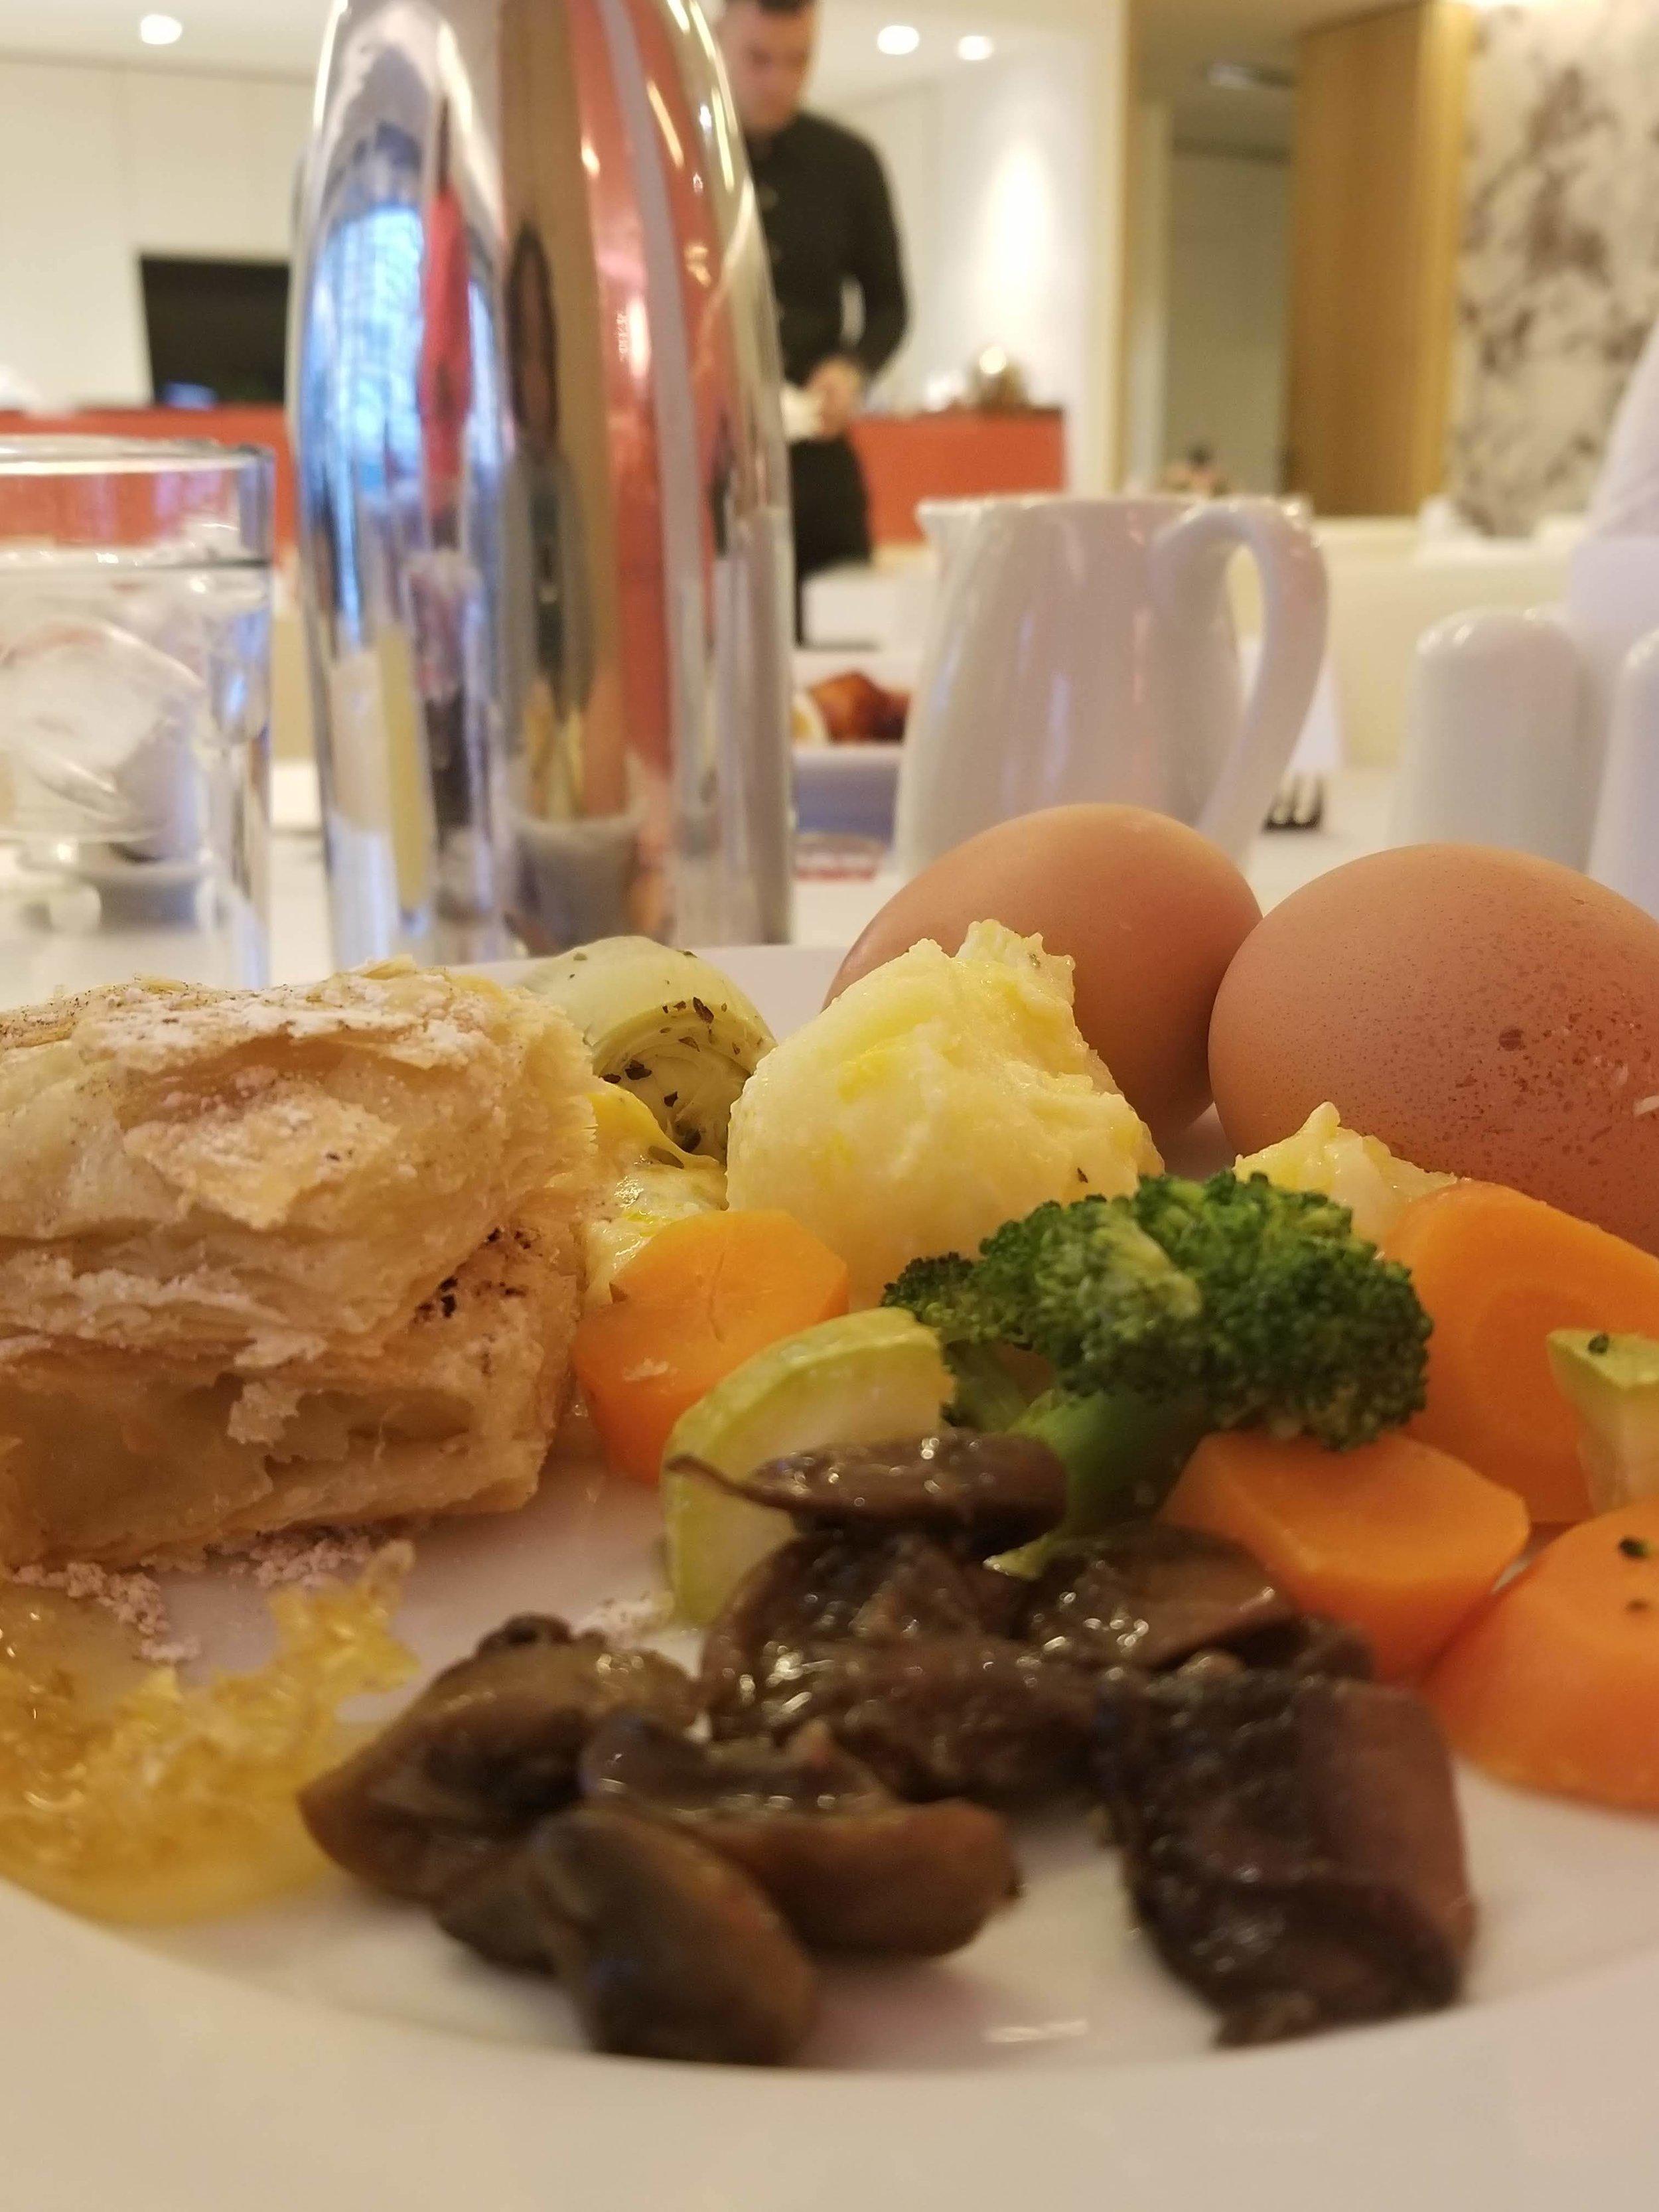 Baklava, artichokes, sautéed mushrooms, steamed veggies, potatoes au gratin, boiled eggs.